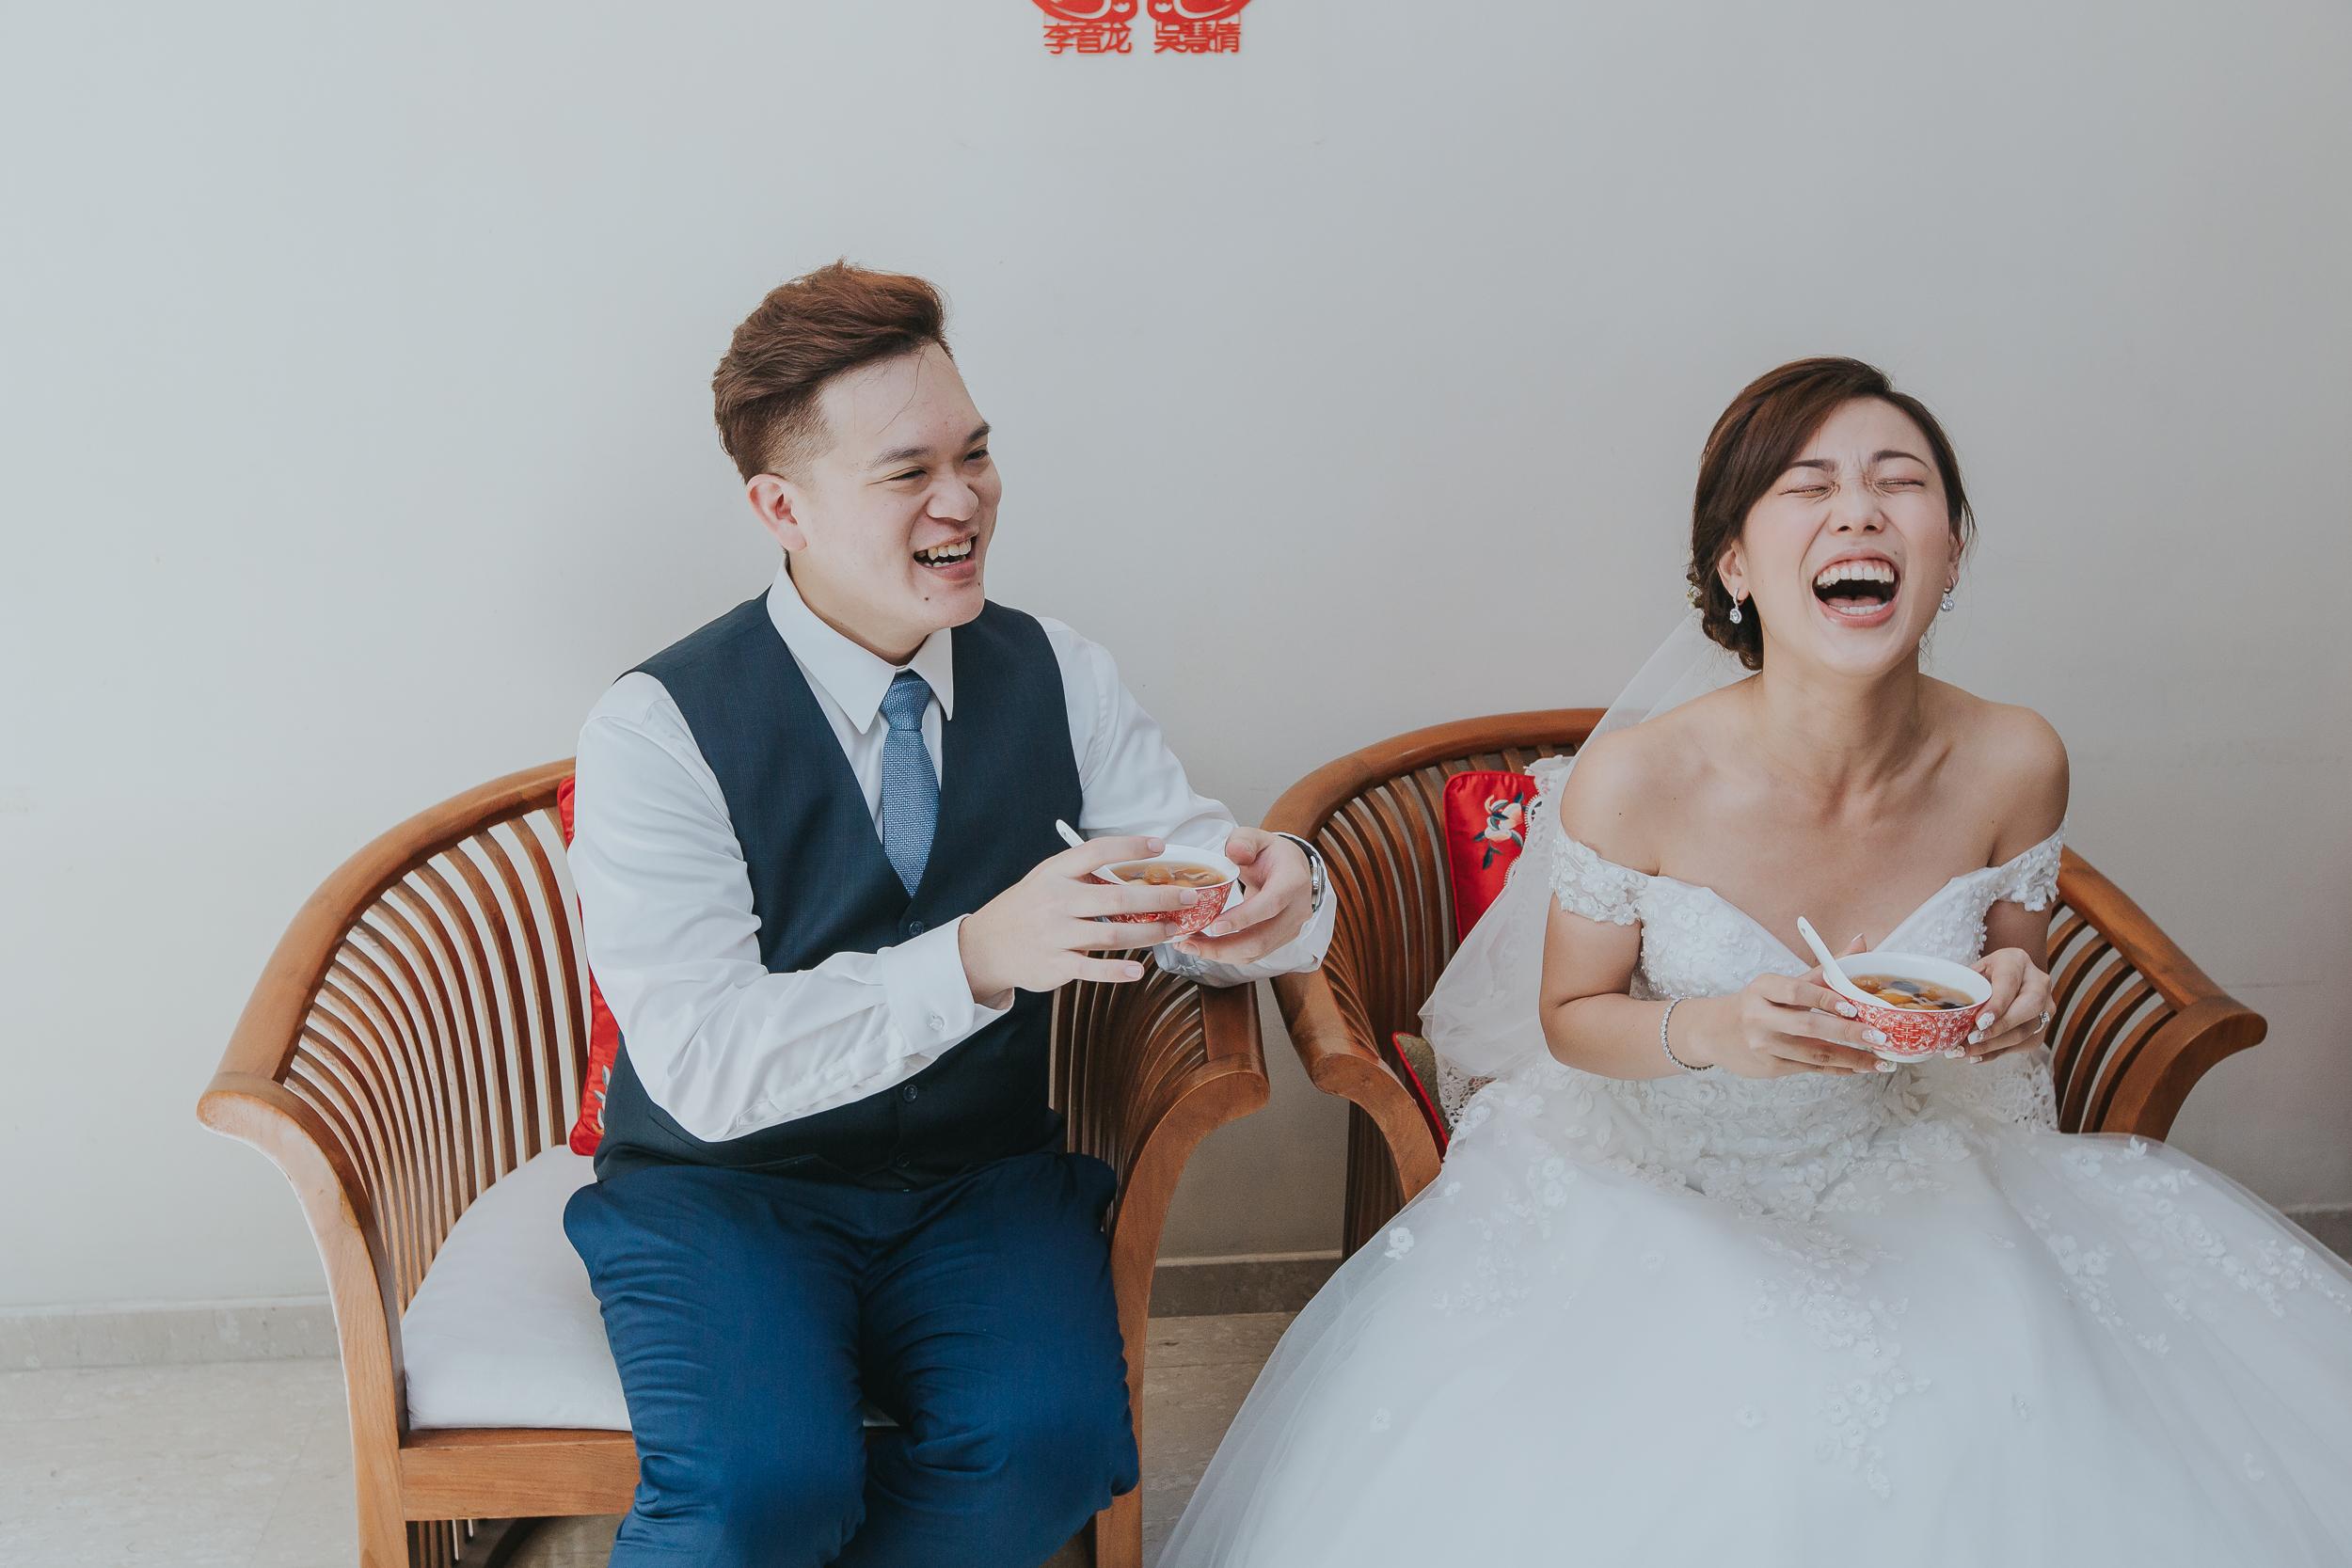 Singapore+Actual+Day+Wedding+Photographer+Grand+Mercure+Oliver+Estelle-0035.jpg